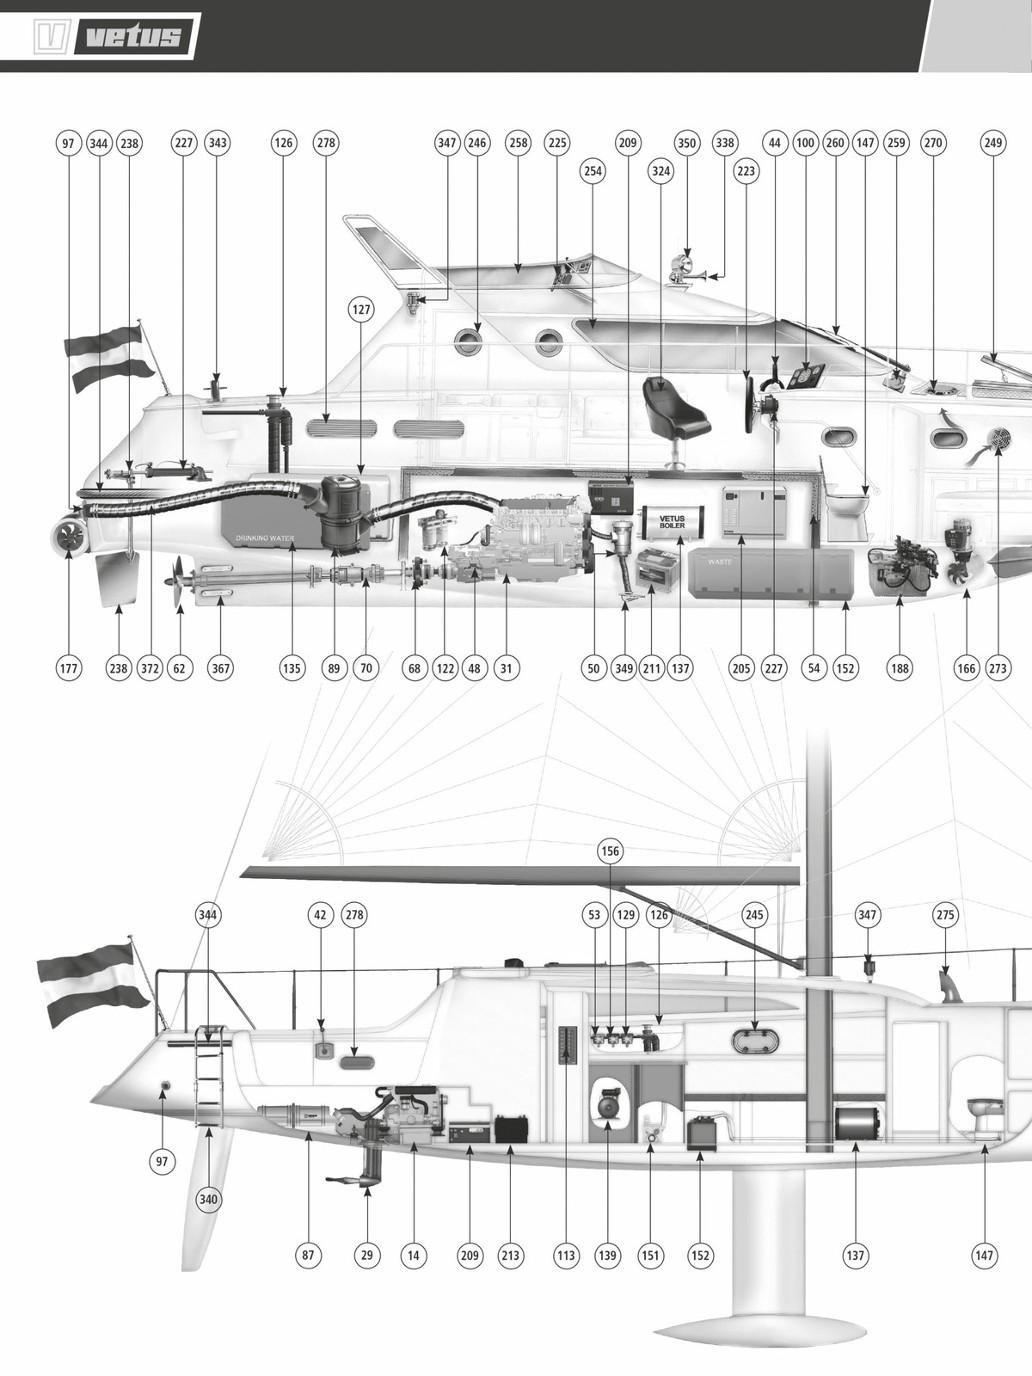 hight resolution of vetus wiper motor wiring diagram wiring library gm wiper motor wiring vetus pricelist 2018 ireland page